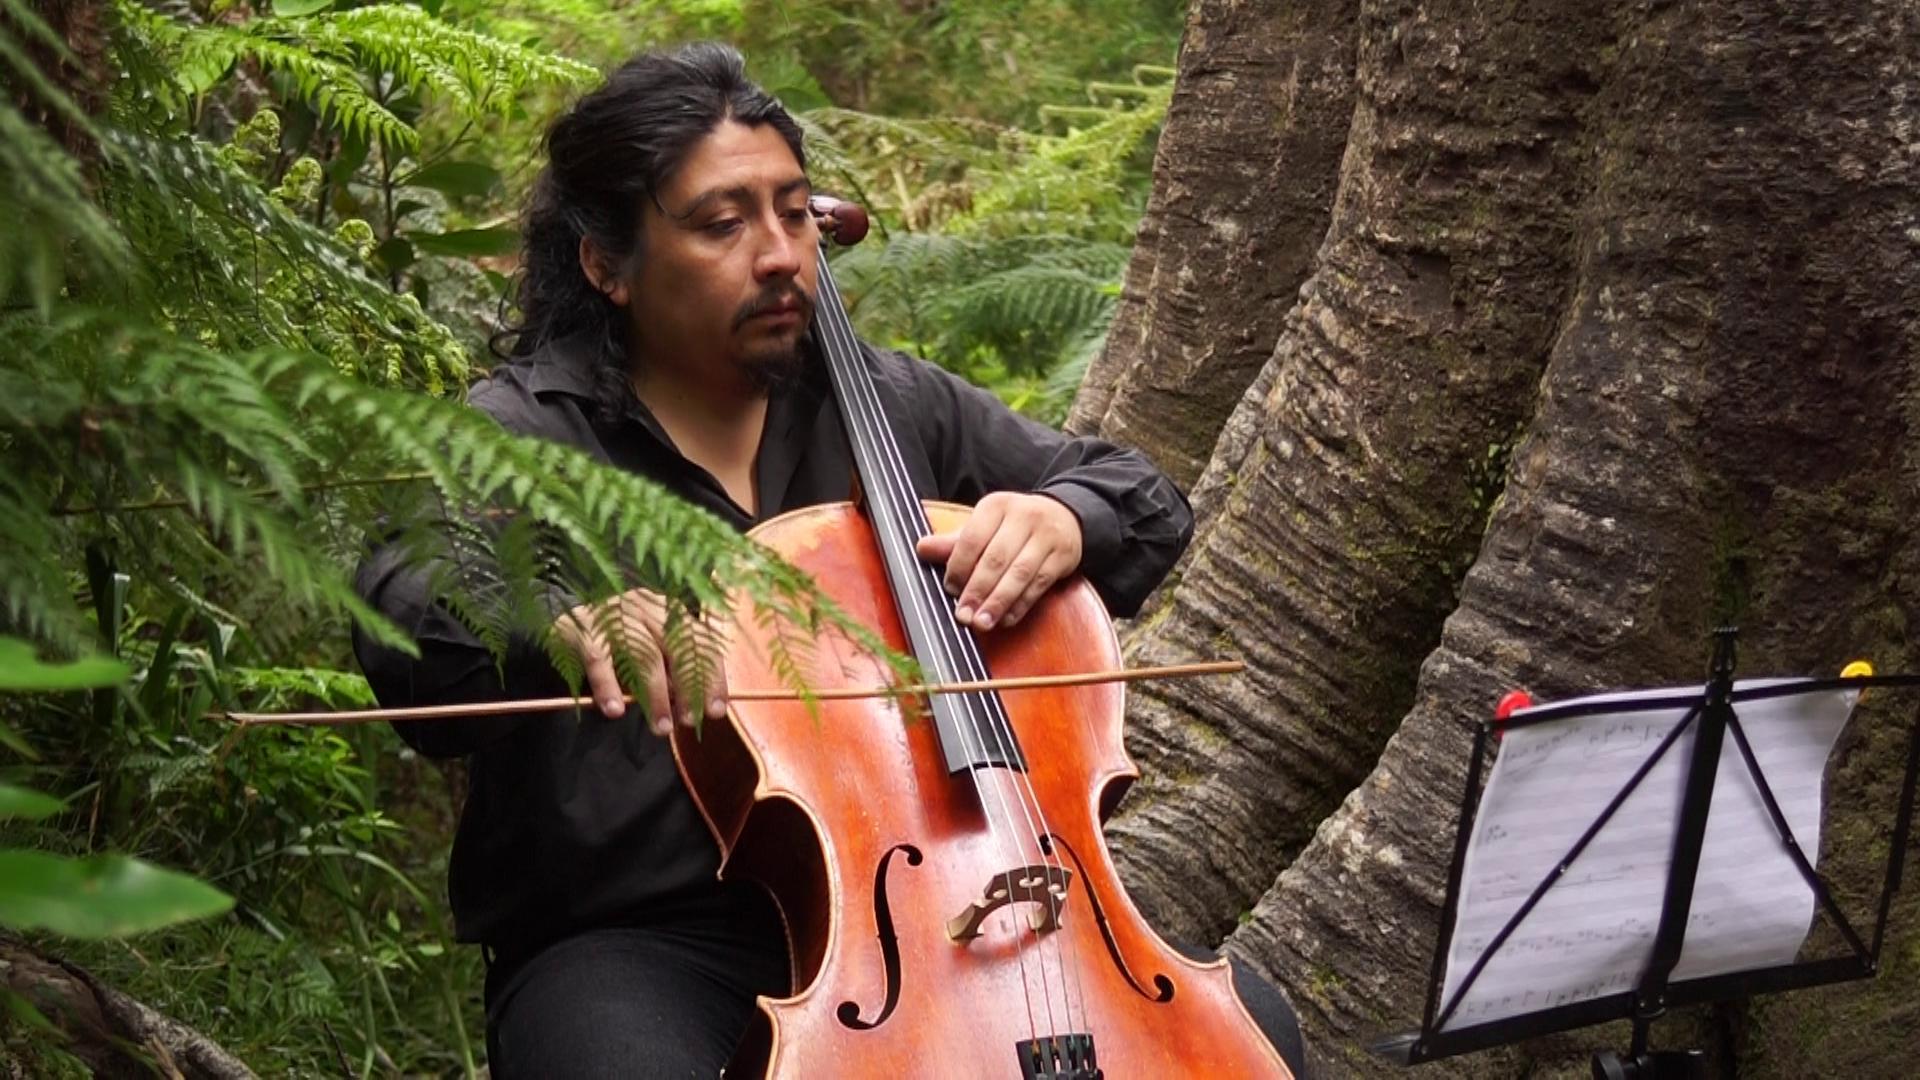 Bosques de Parque Oncol inspiraron una innovadora obra musical